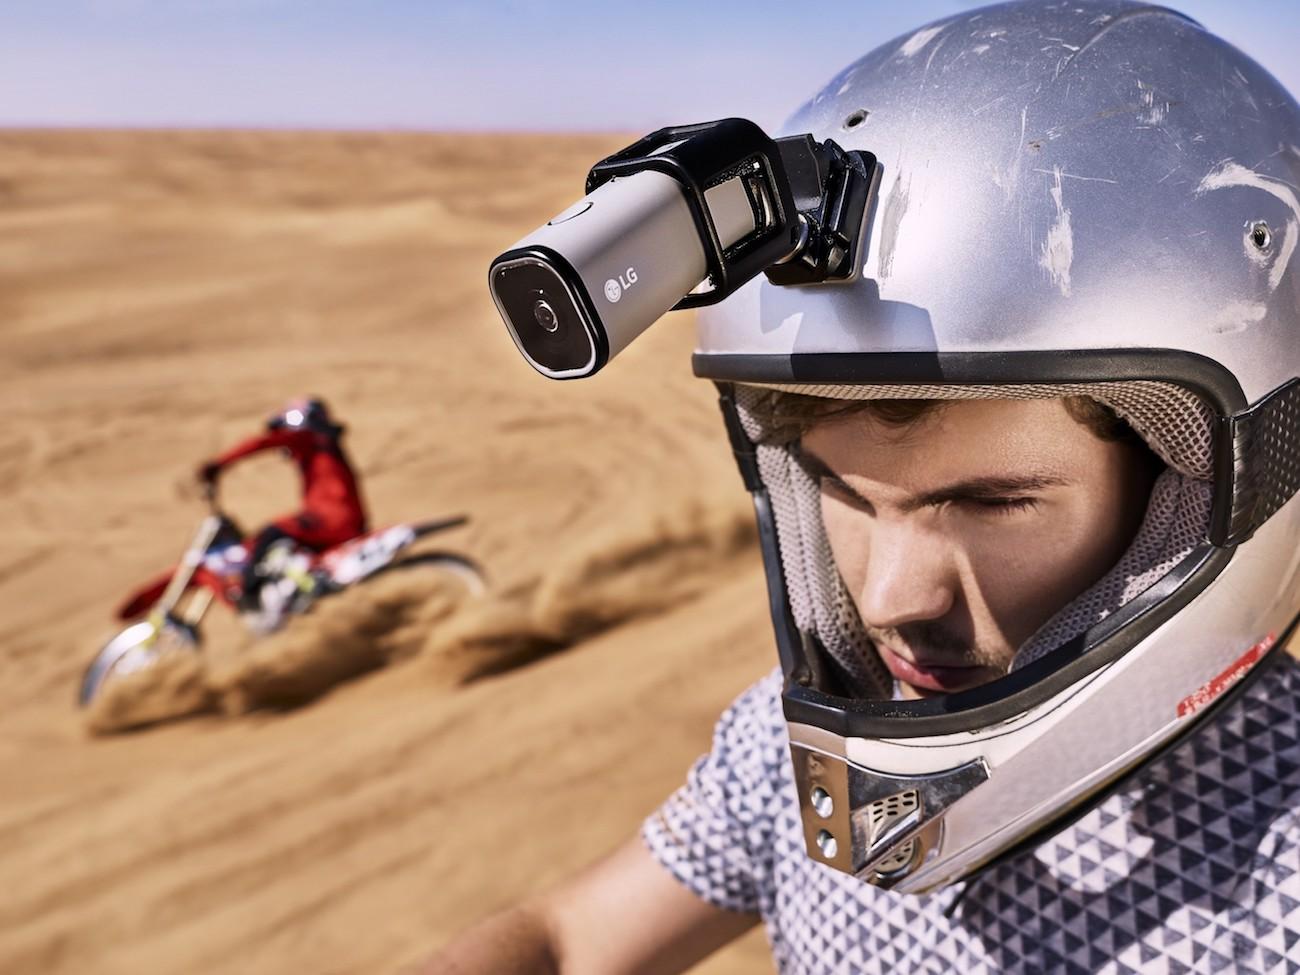 LG+Action+CAM+LTE+Camera